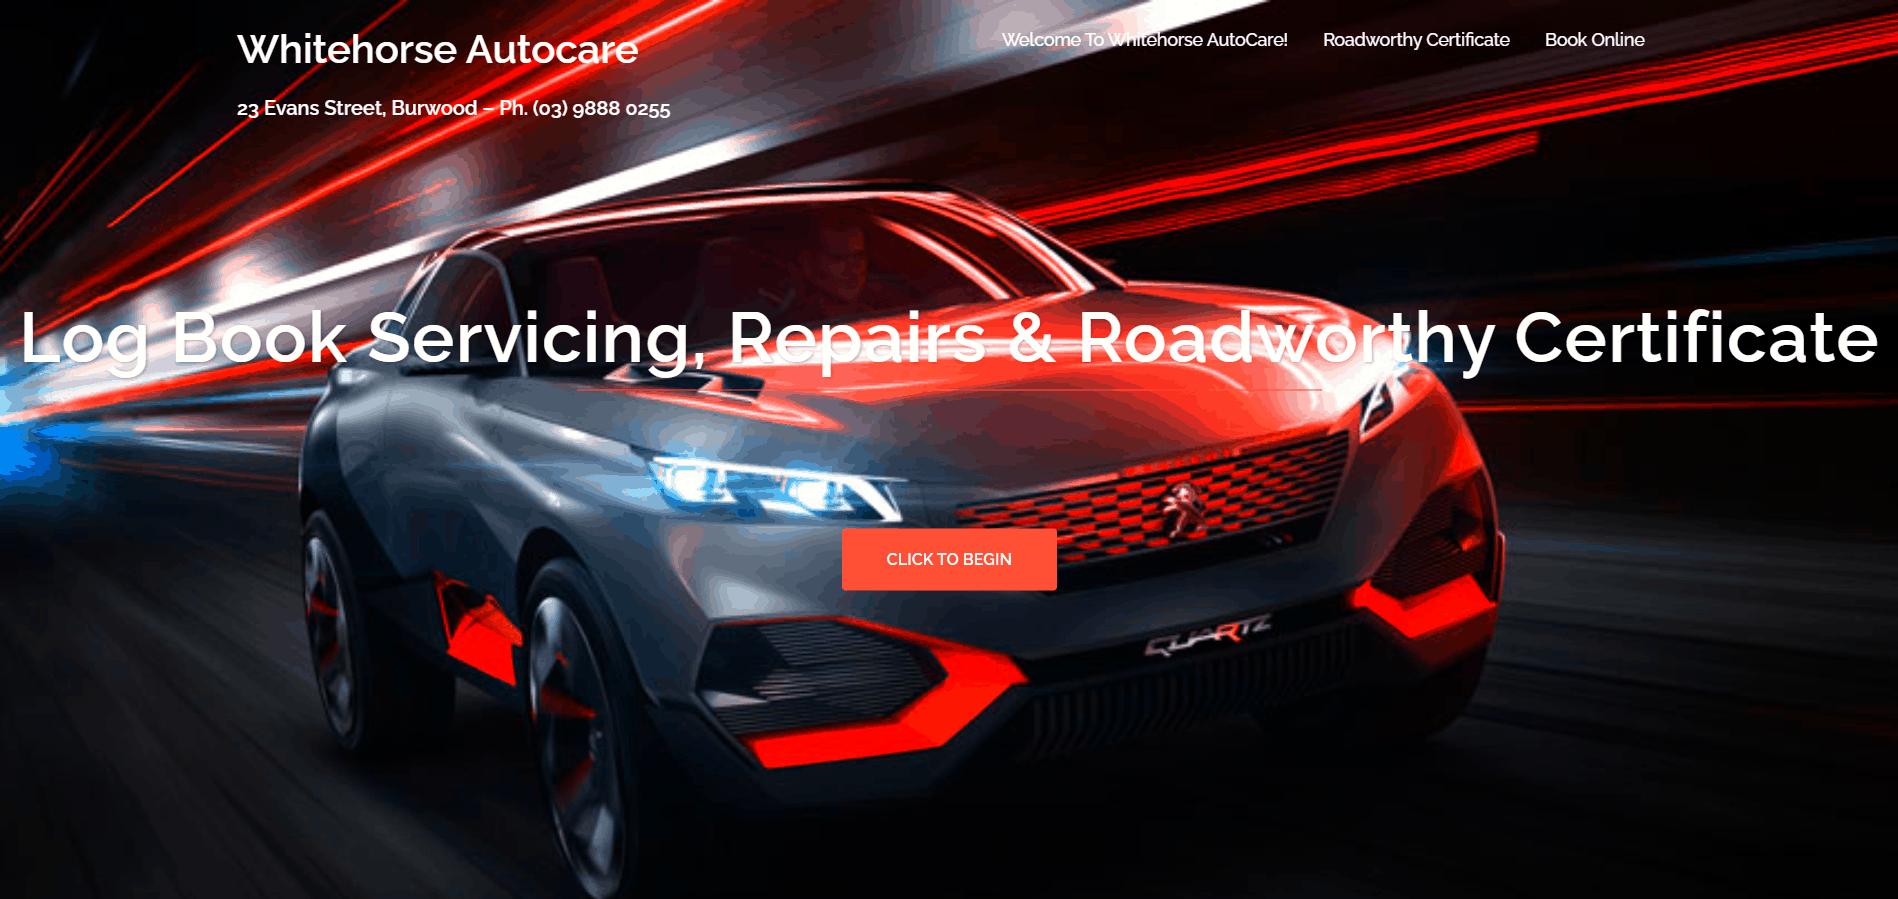 Whitehorse Autocare